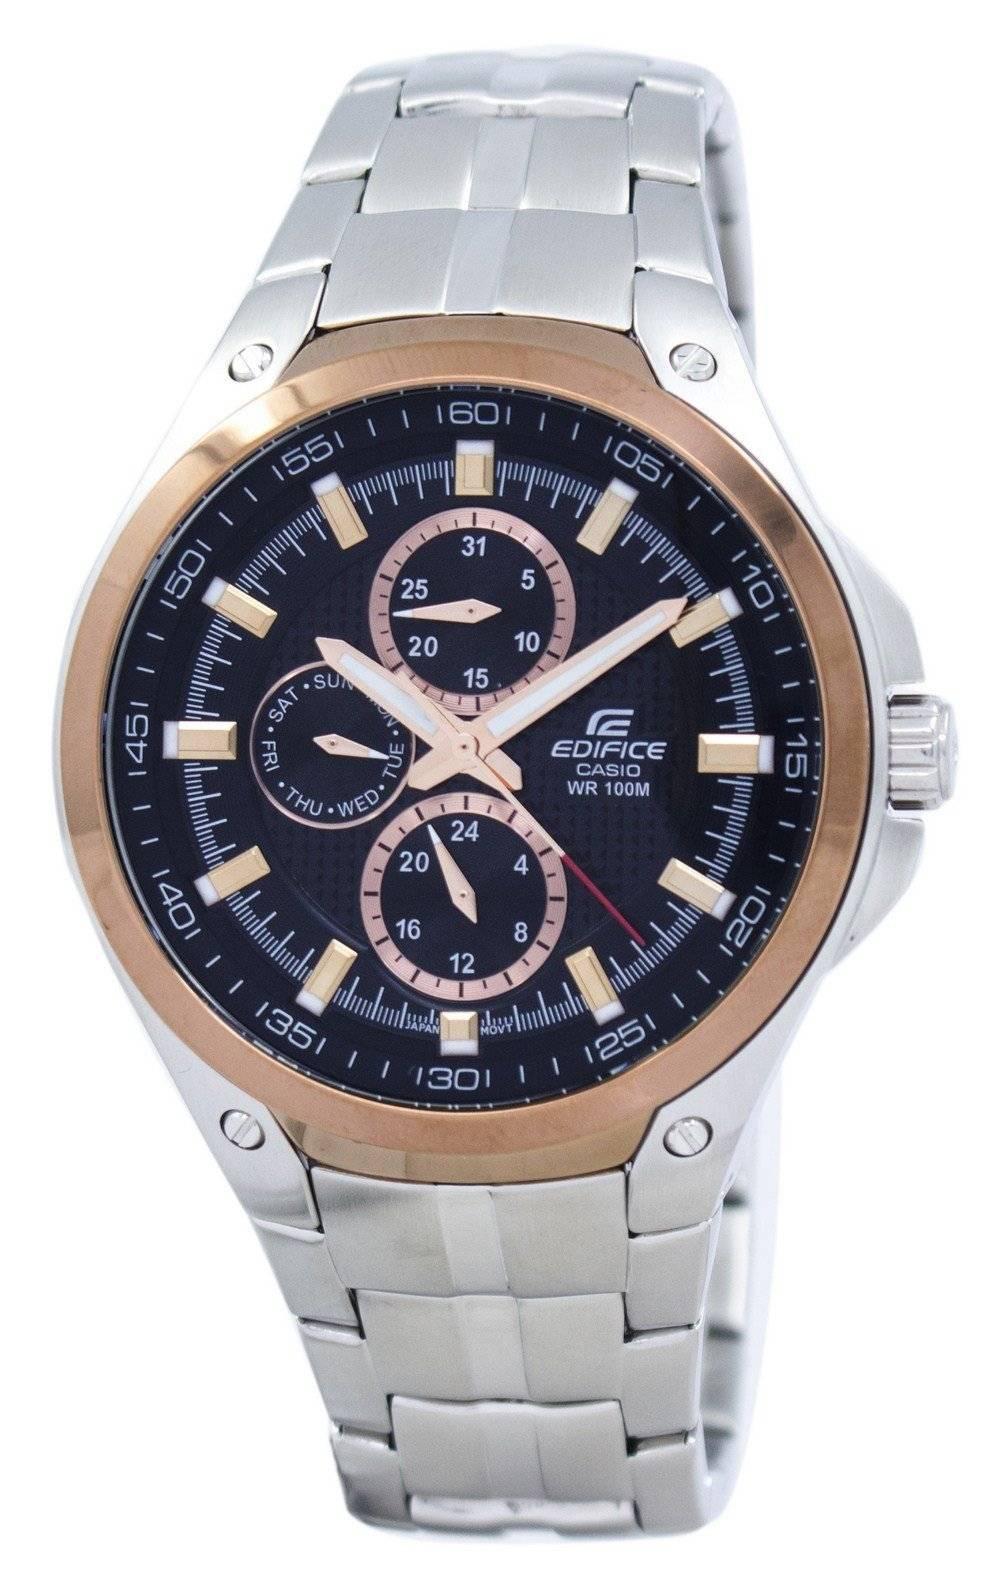 bdc85365500 Casio Edifice EF-326D-1AVDF EF-326D-1AV EF-326D-1 Men s Watch ...